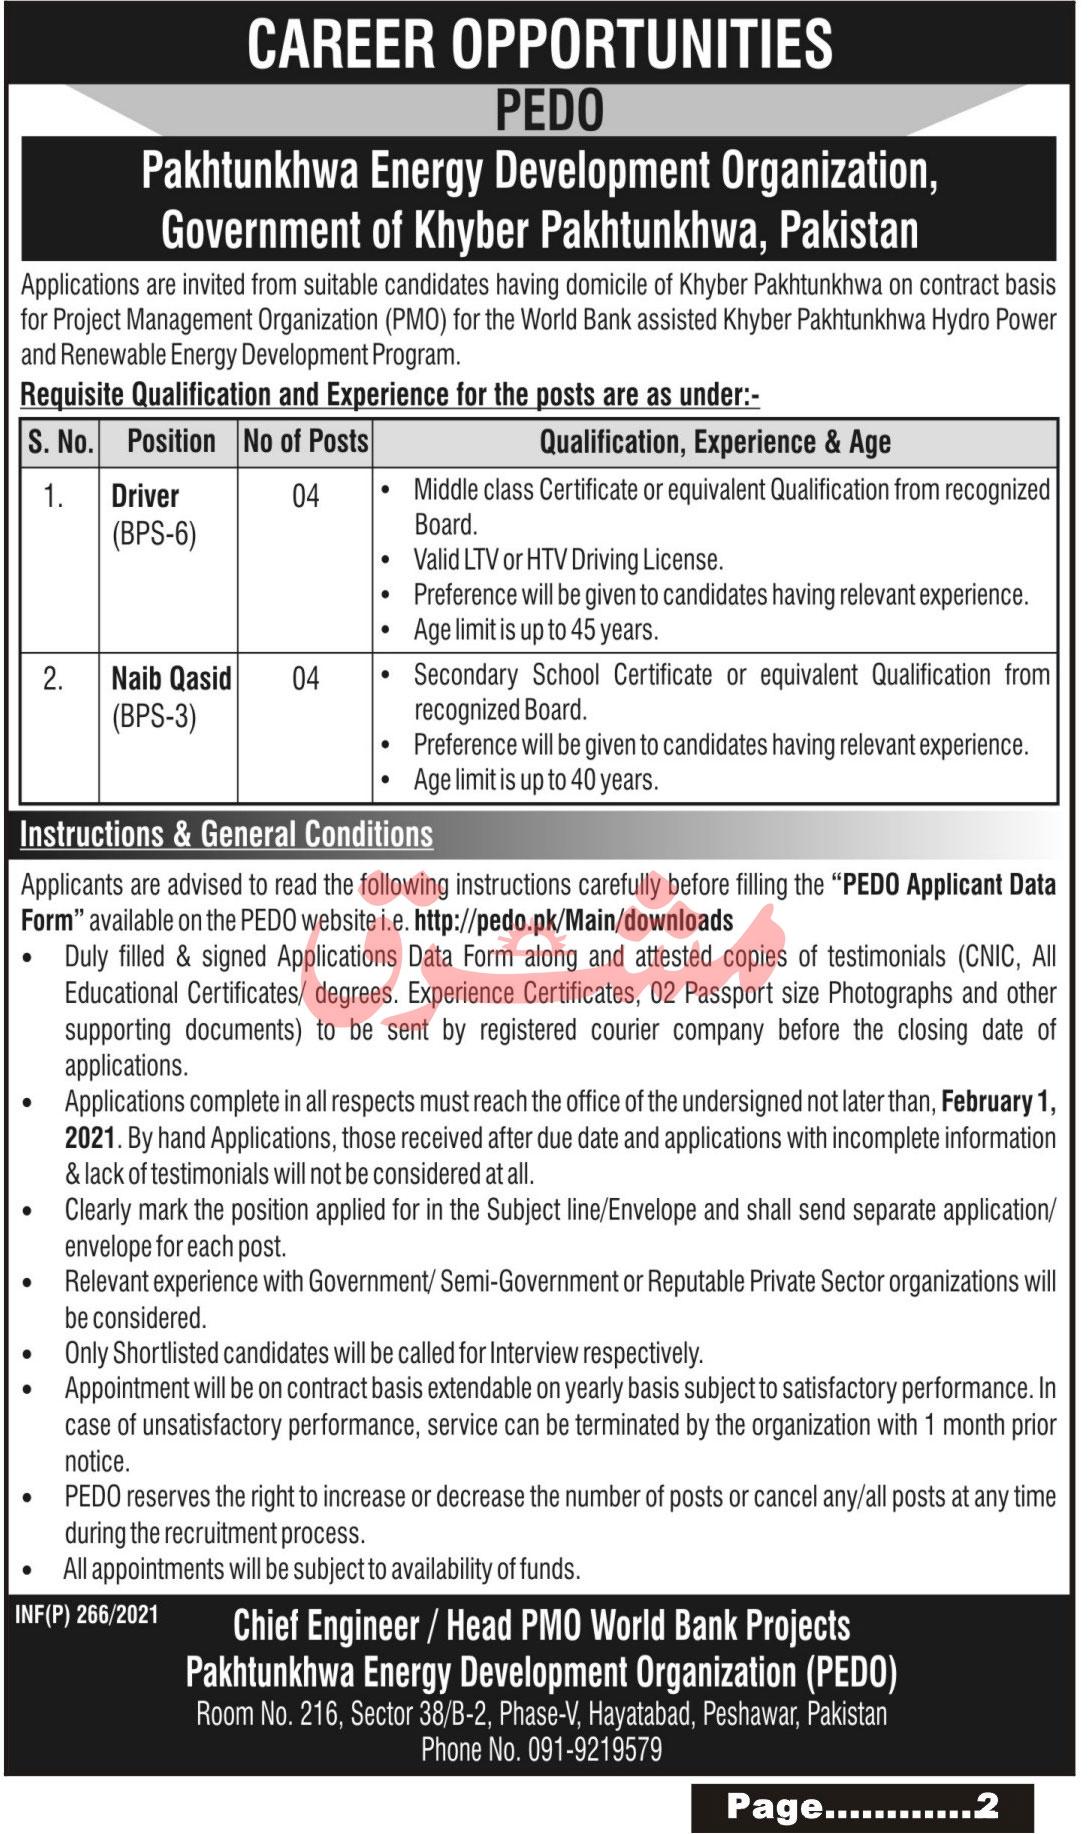 PEDO Applicant Data Form - pedo.pk/Main/downloads - Pakhtunkhwa Energy Development Organization Jobs 2021 - PEDO Jobs 2021